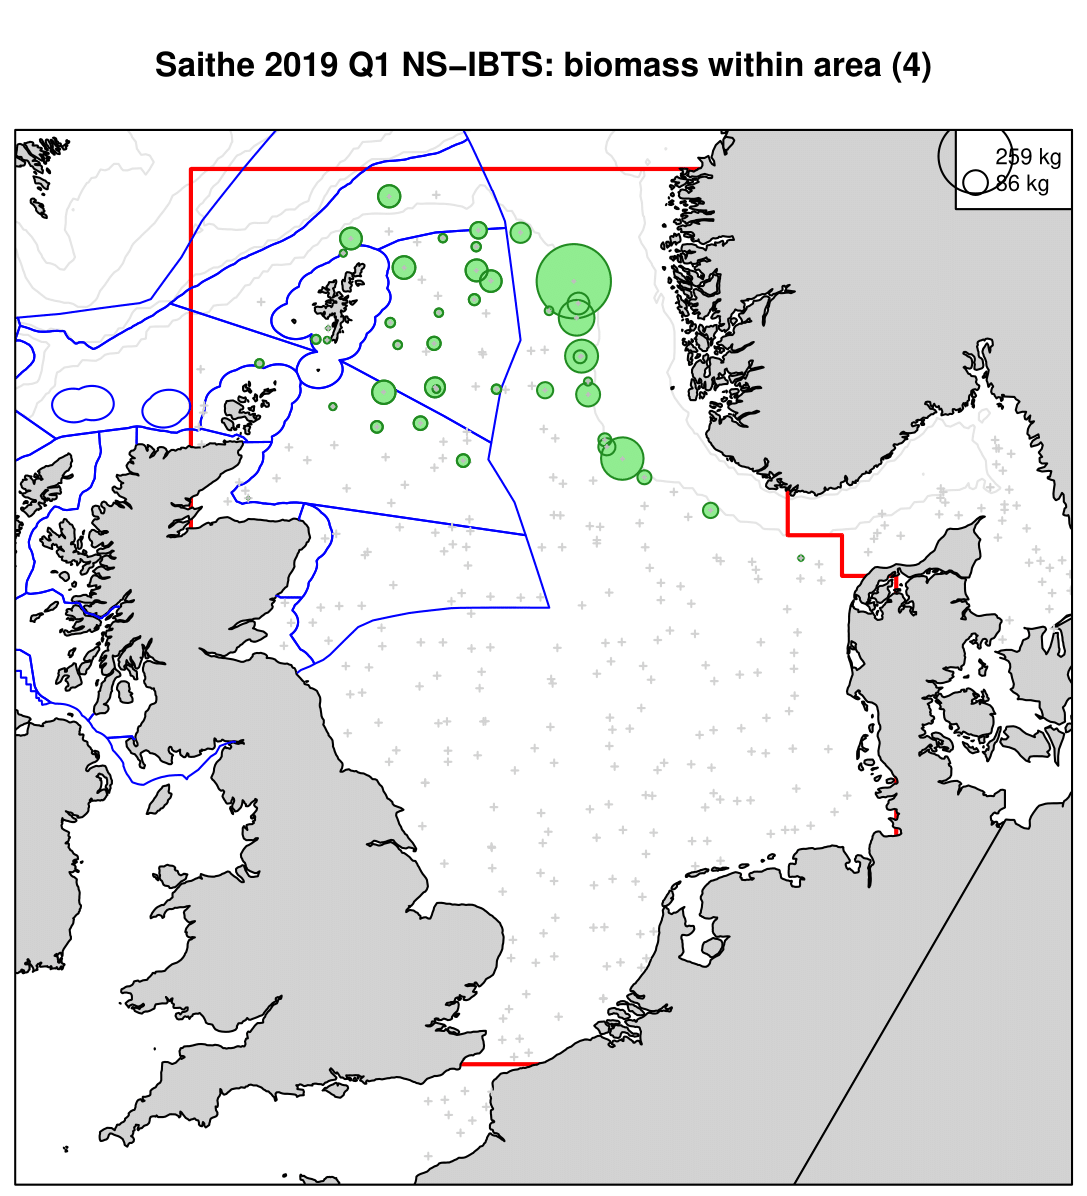 Saithe 2019 Q1 NS-IBTS: biomass within area (4)